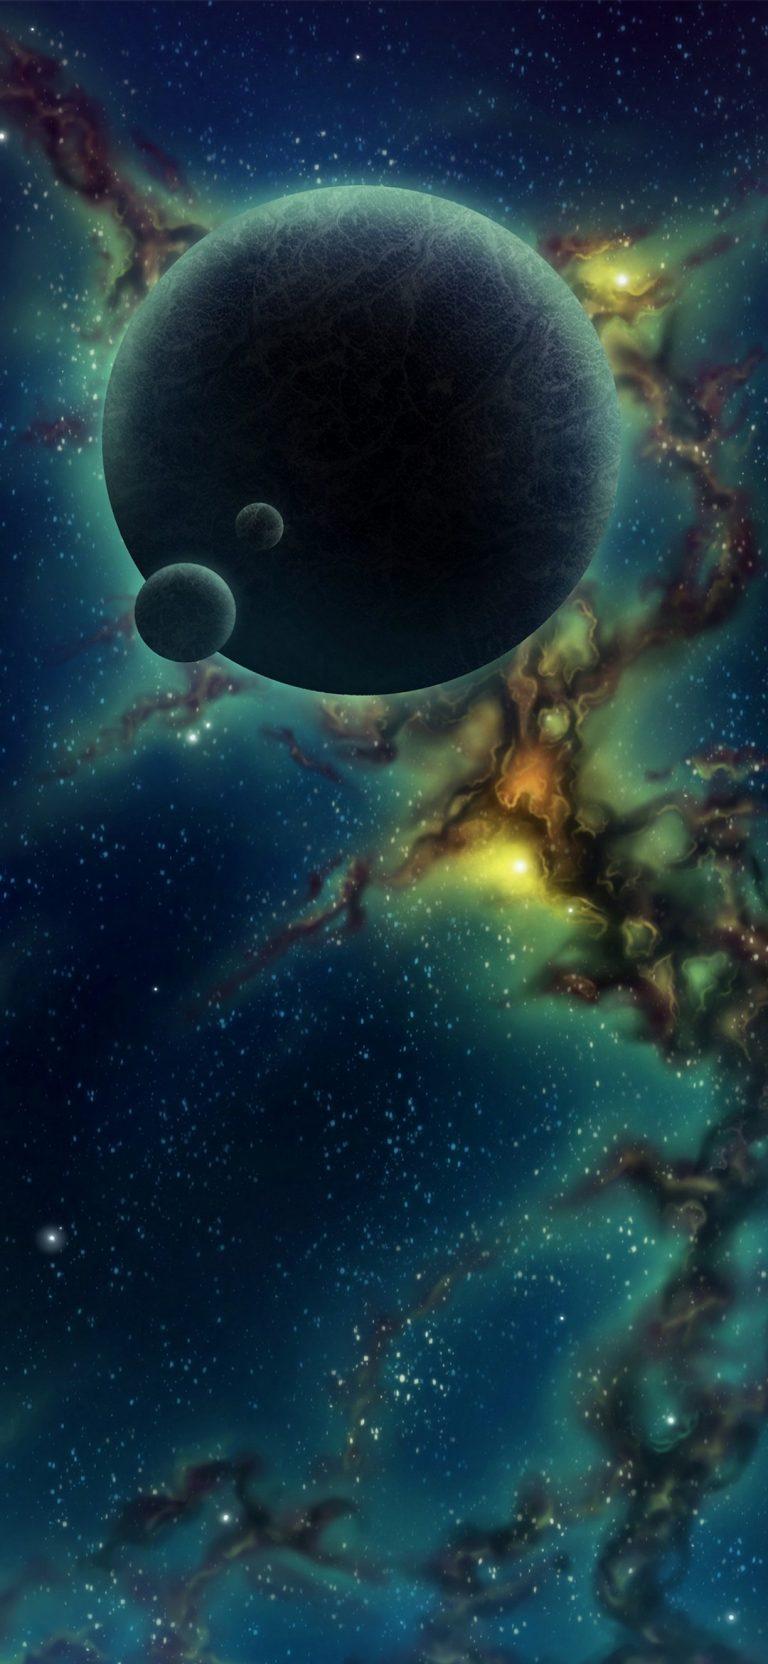 Space Phone Wallpaper 113 1080x2340 768x1664